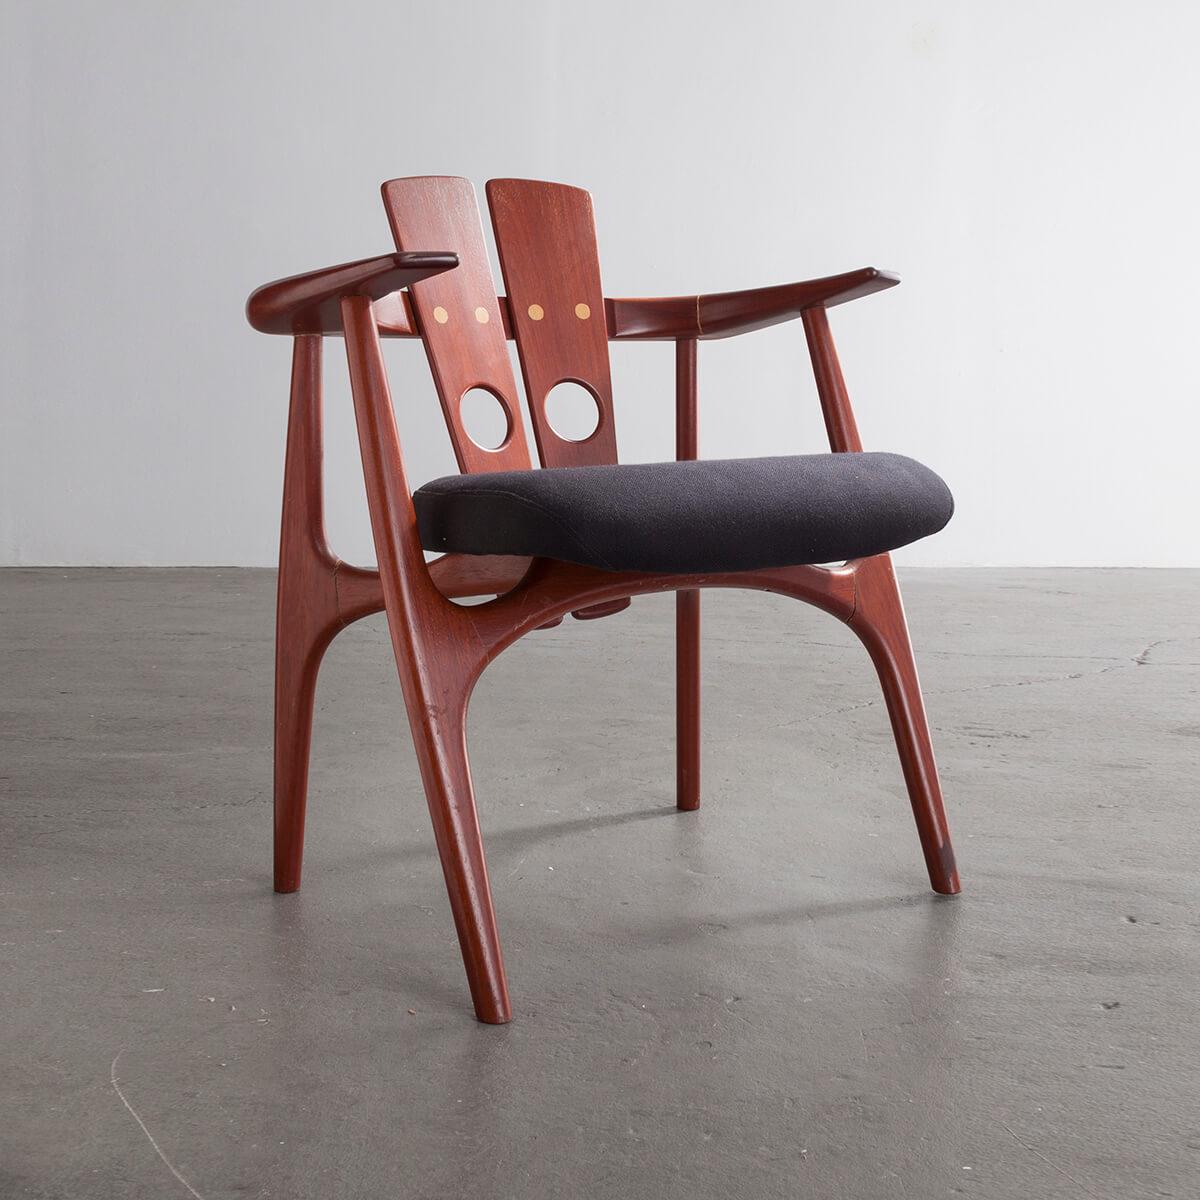 Astounding Katita Chair In Jatoba Brazilian Cherry Wood By Sergio Machost Co Dining Chair Design Ideas Machostcouk